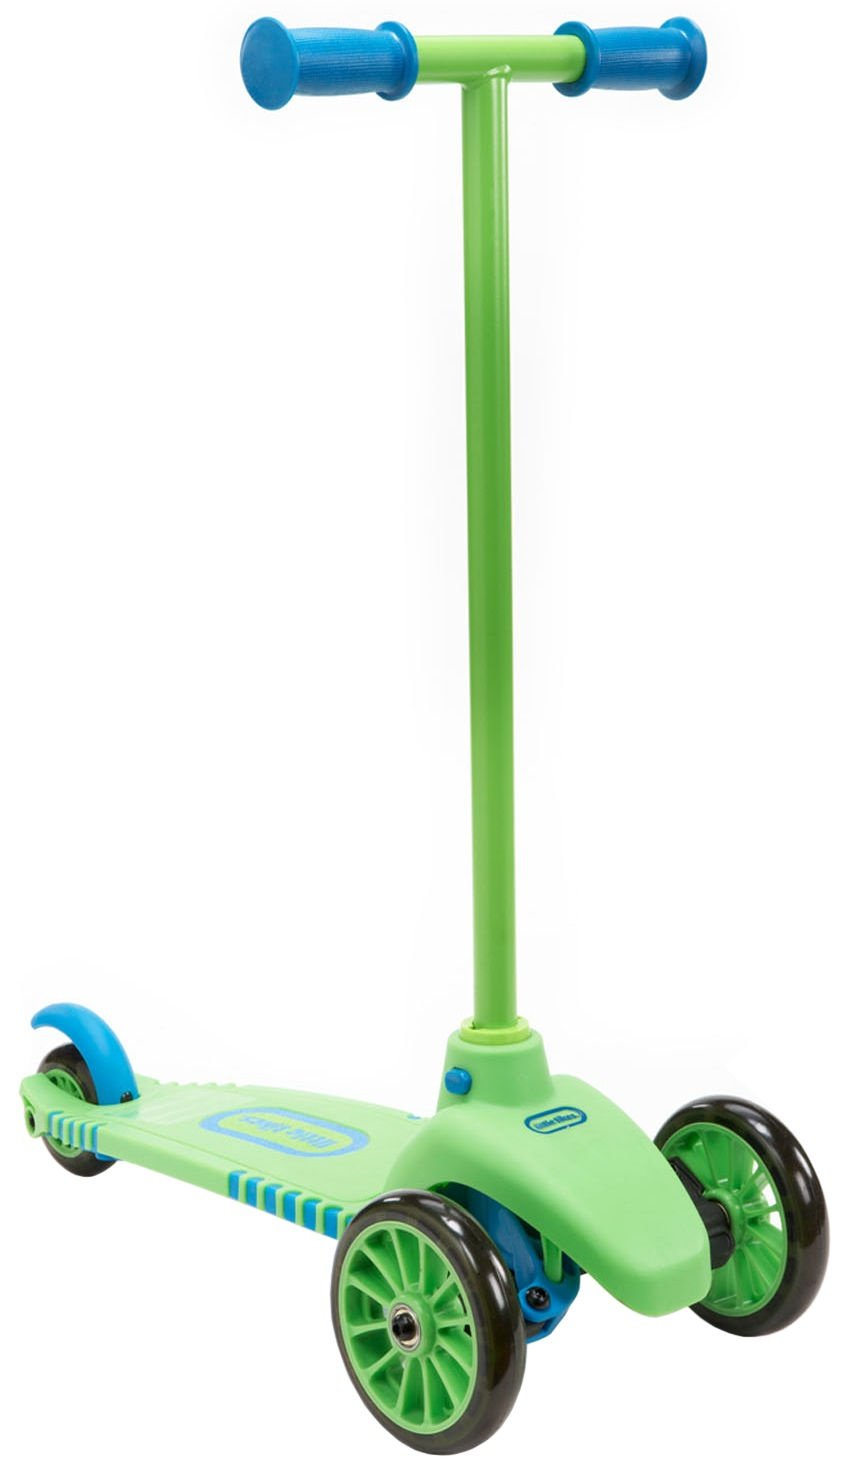 Skrejritenis Little Tikes Lean To Turn green/blue